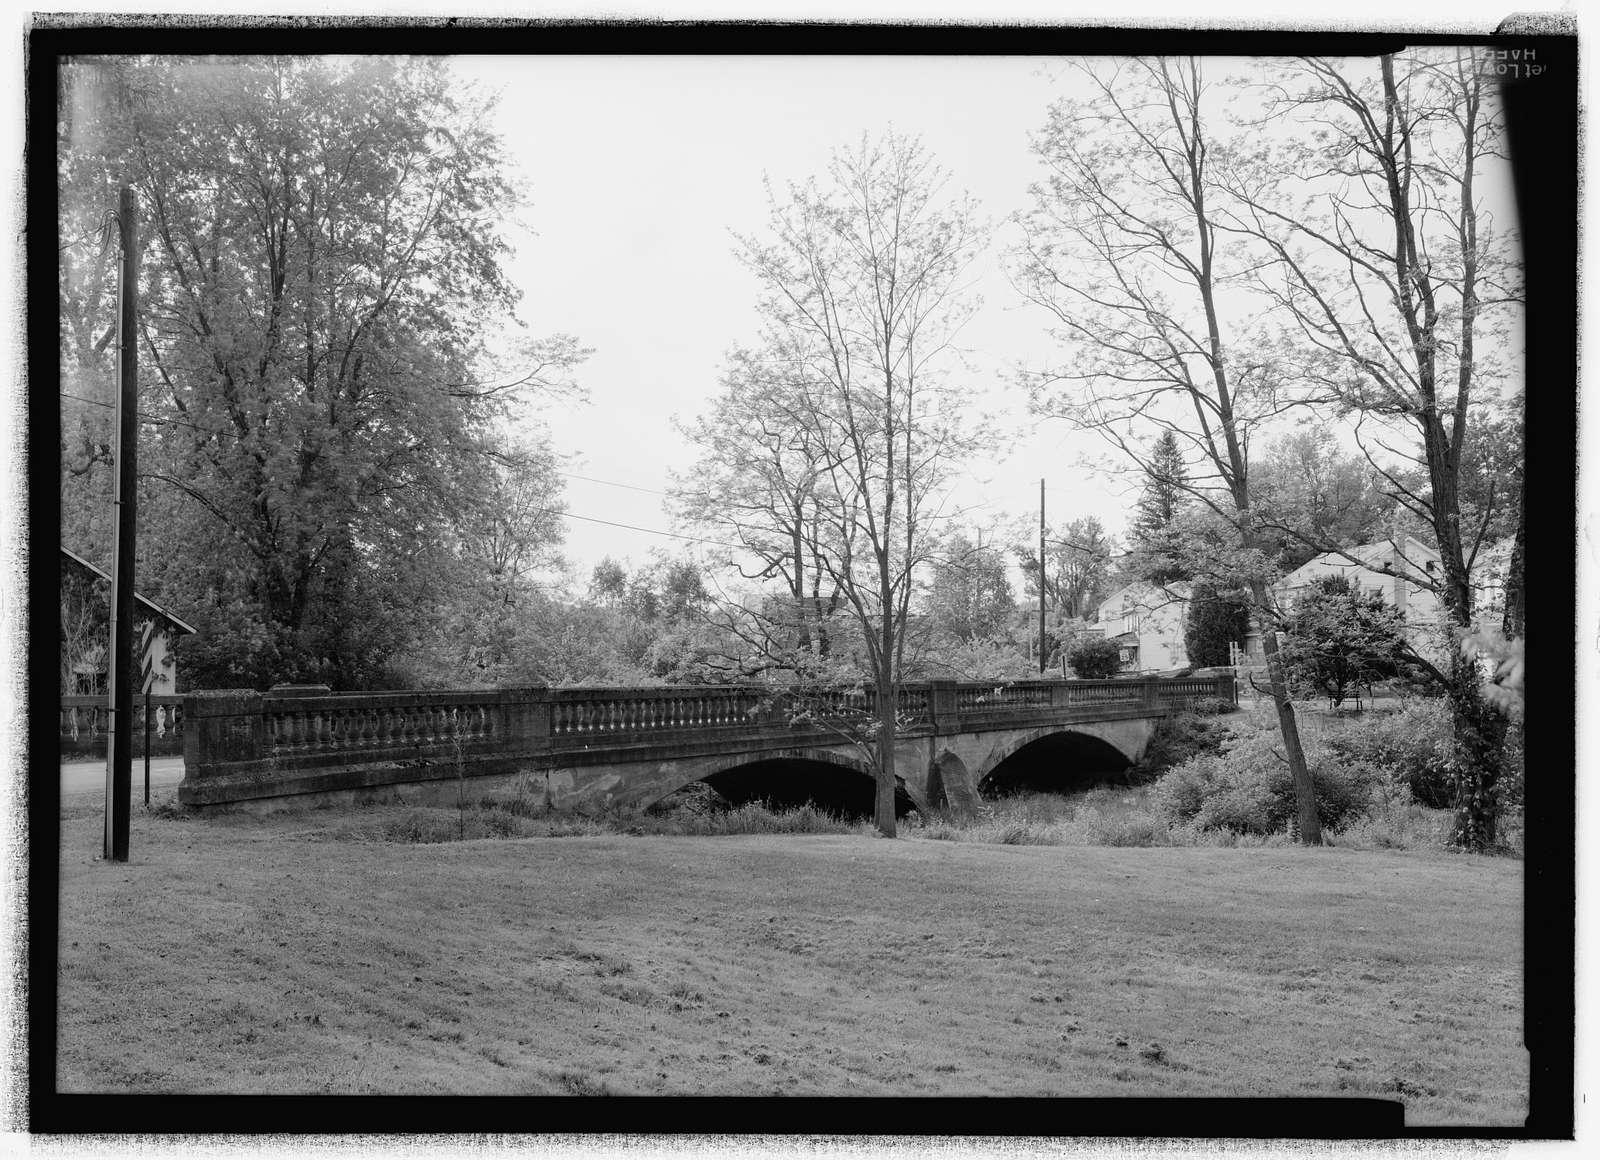 Roaring Creek Bridge, State Road 2005 spanning Roaring Creek in Locust Township, Slabtown, Columbia County, PA